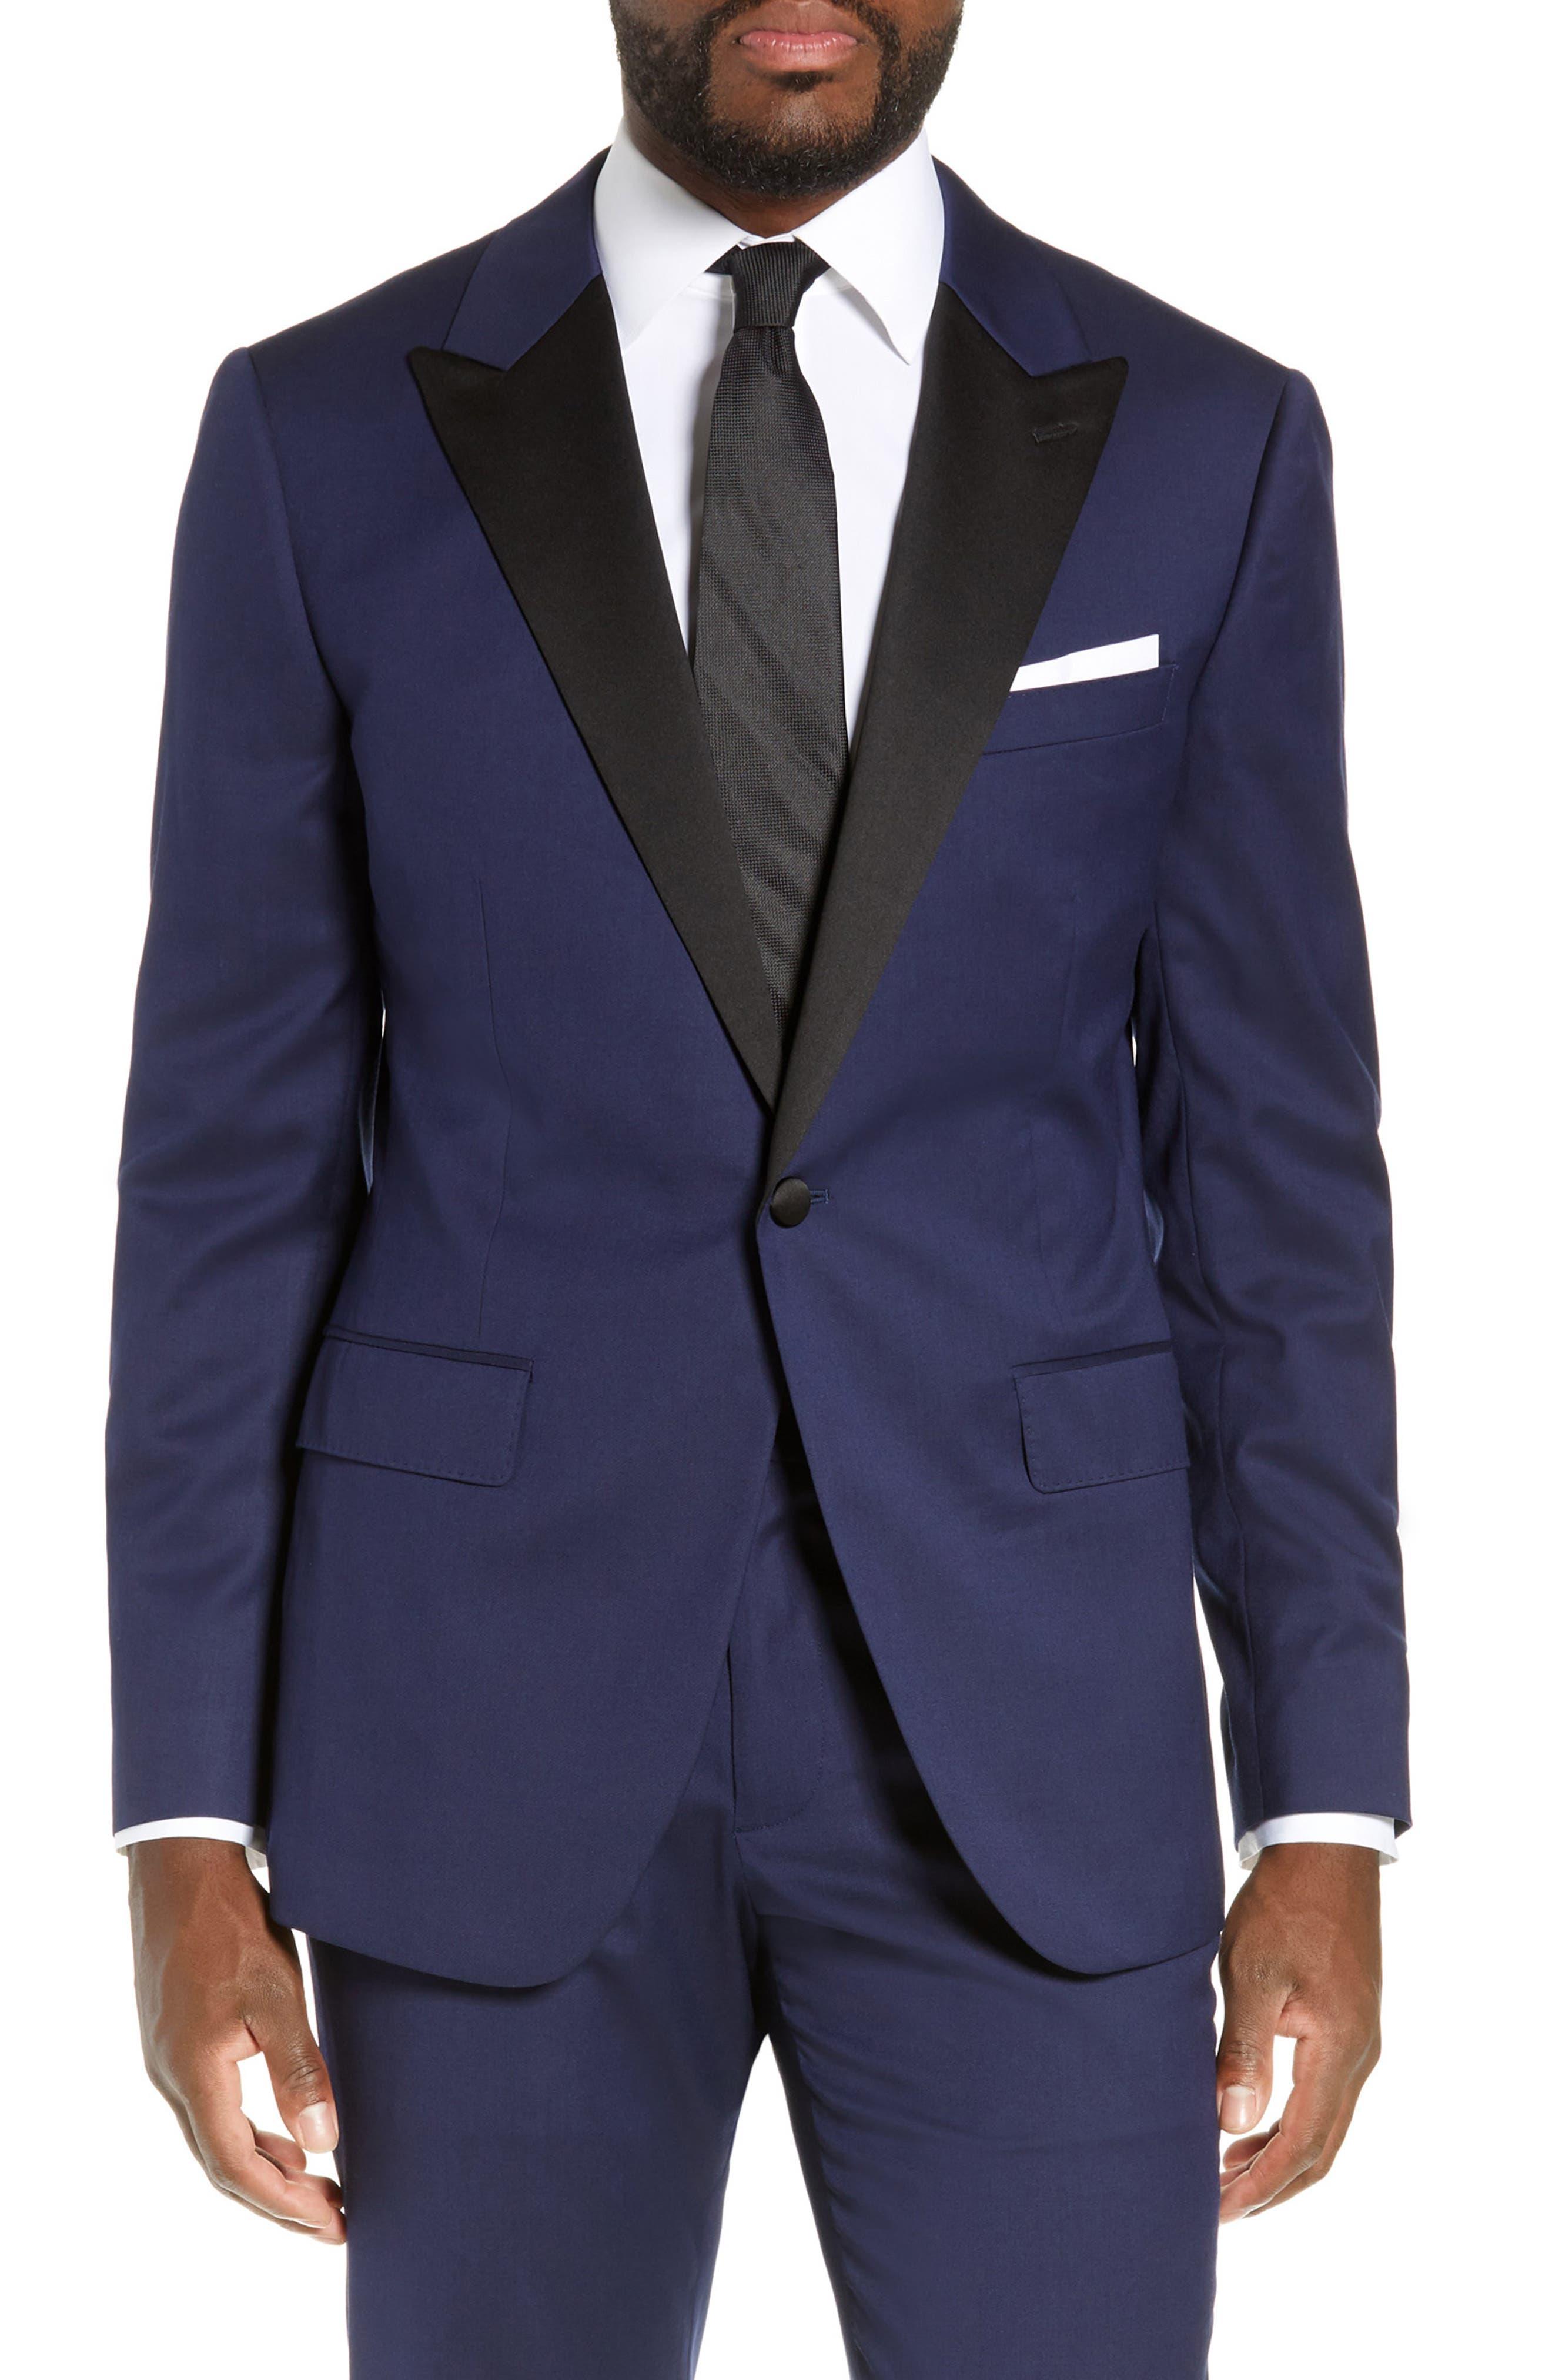 Capstone Slim Fit Italian Wool Blend Dinner Jacket,                             Main thumbnail 1, color,                             NAVY